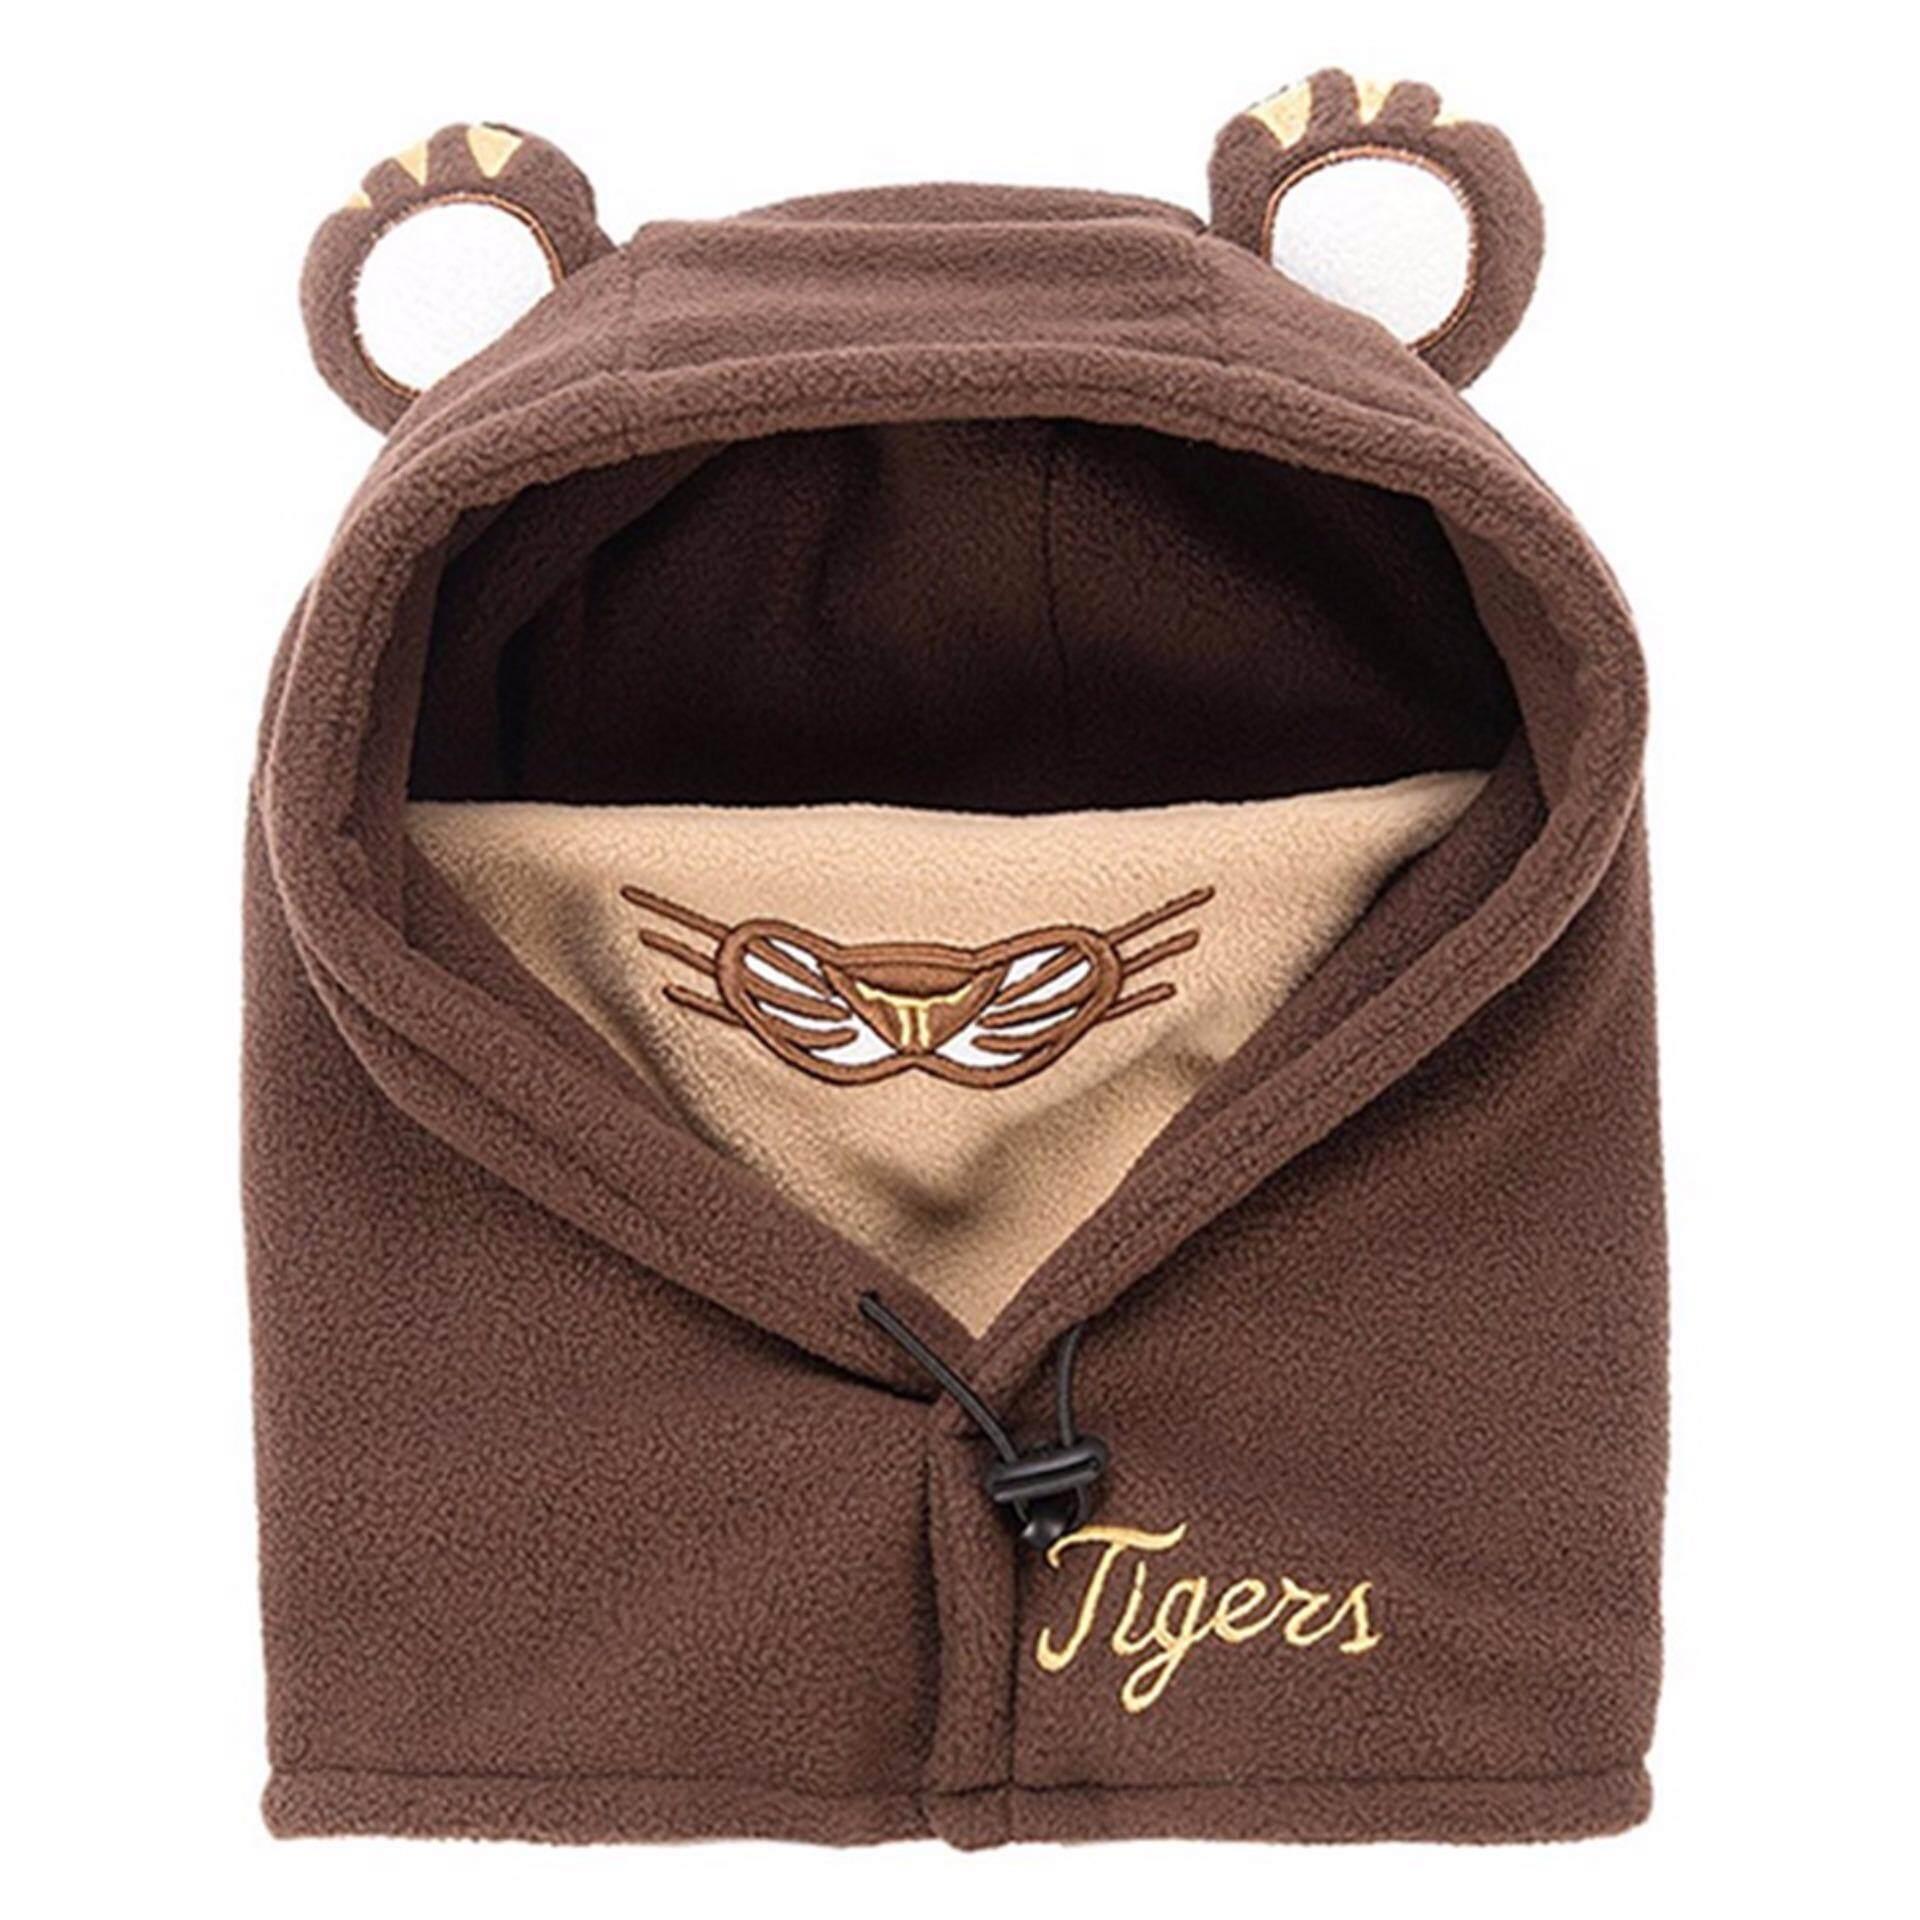 Smile YKK Children Baby Winter Ear Cap Hooded Head Tiger Neck Warm Hat Coffee - intl